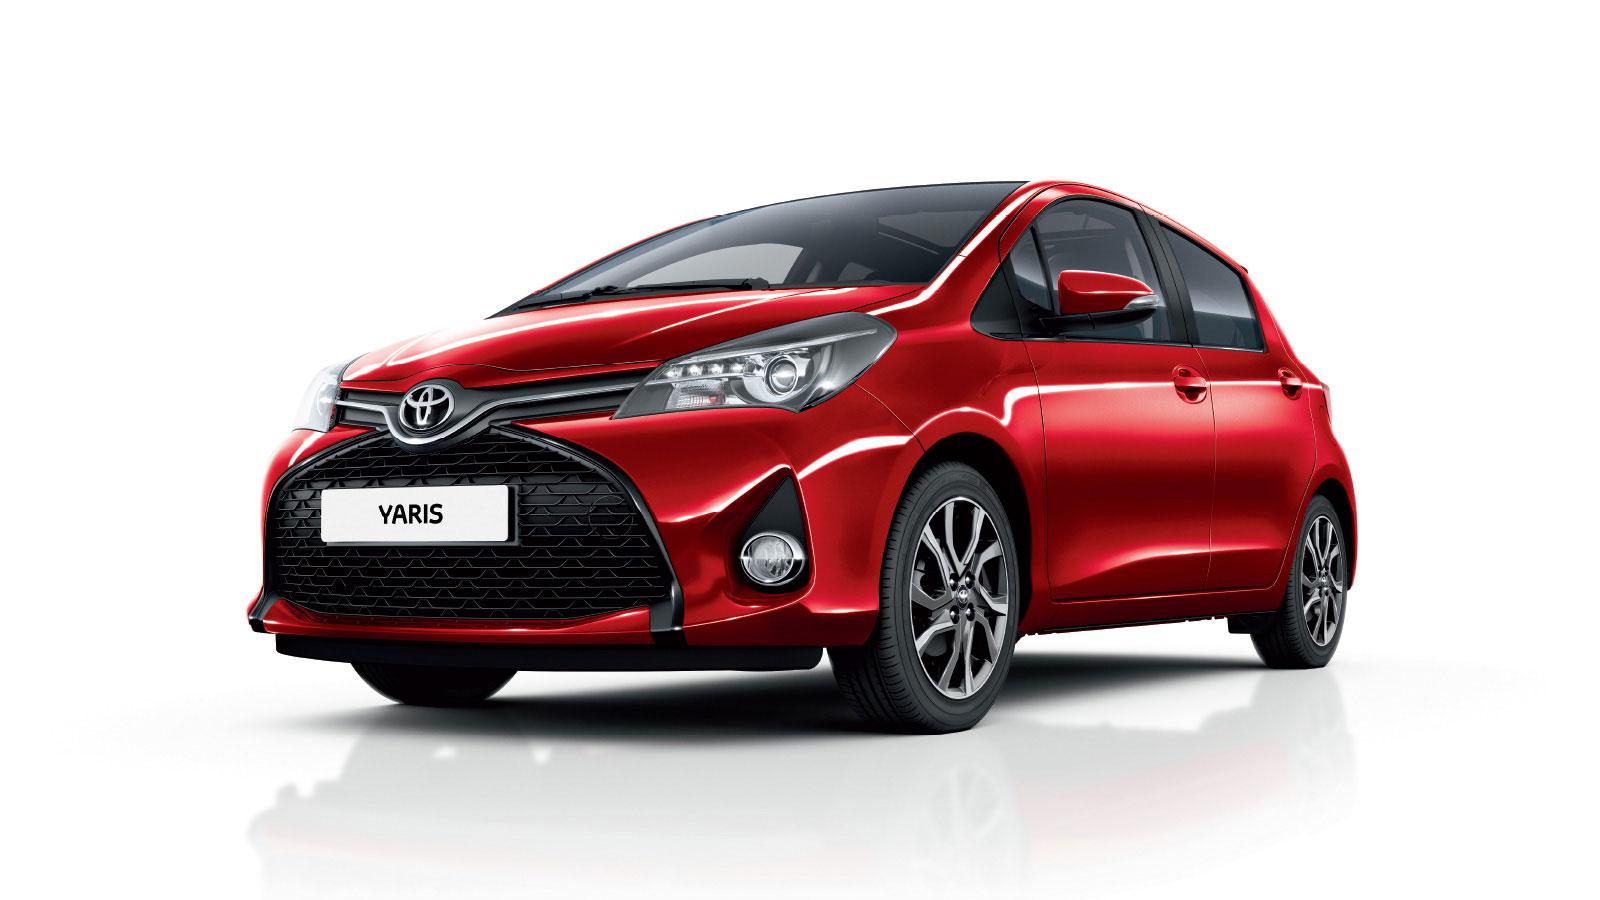 Toyota Yaris 2014. © Toyota